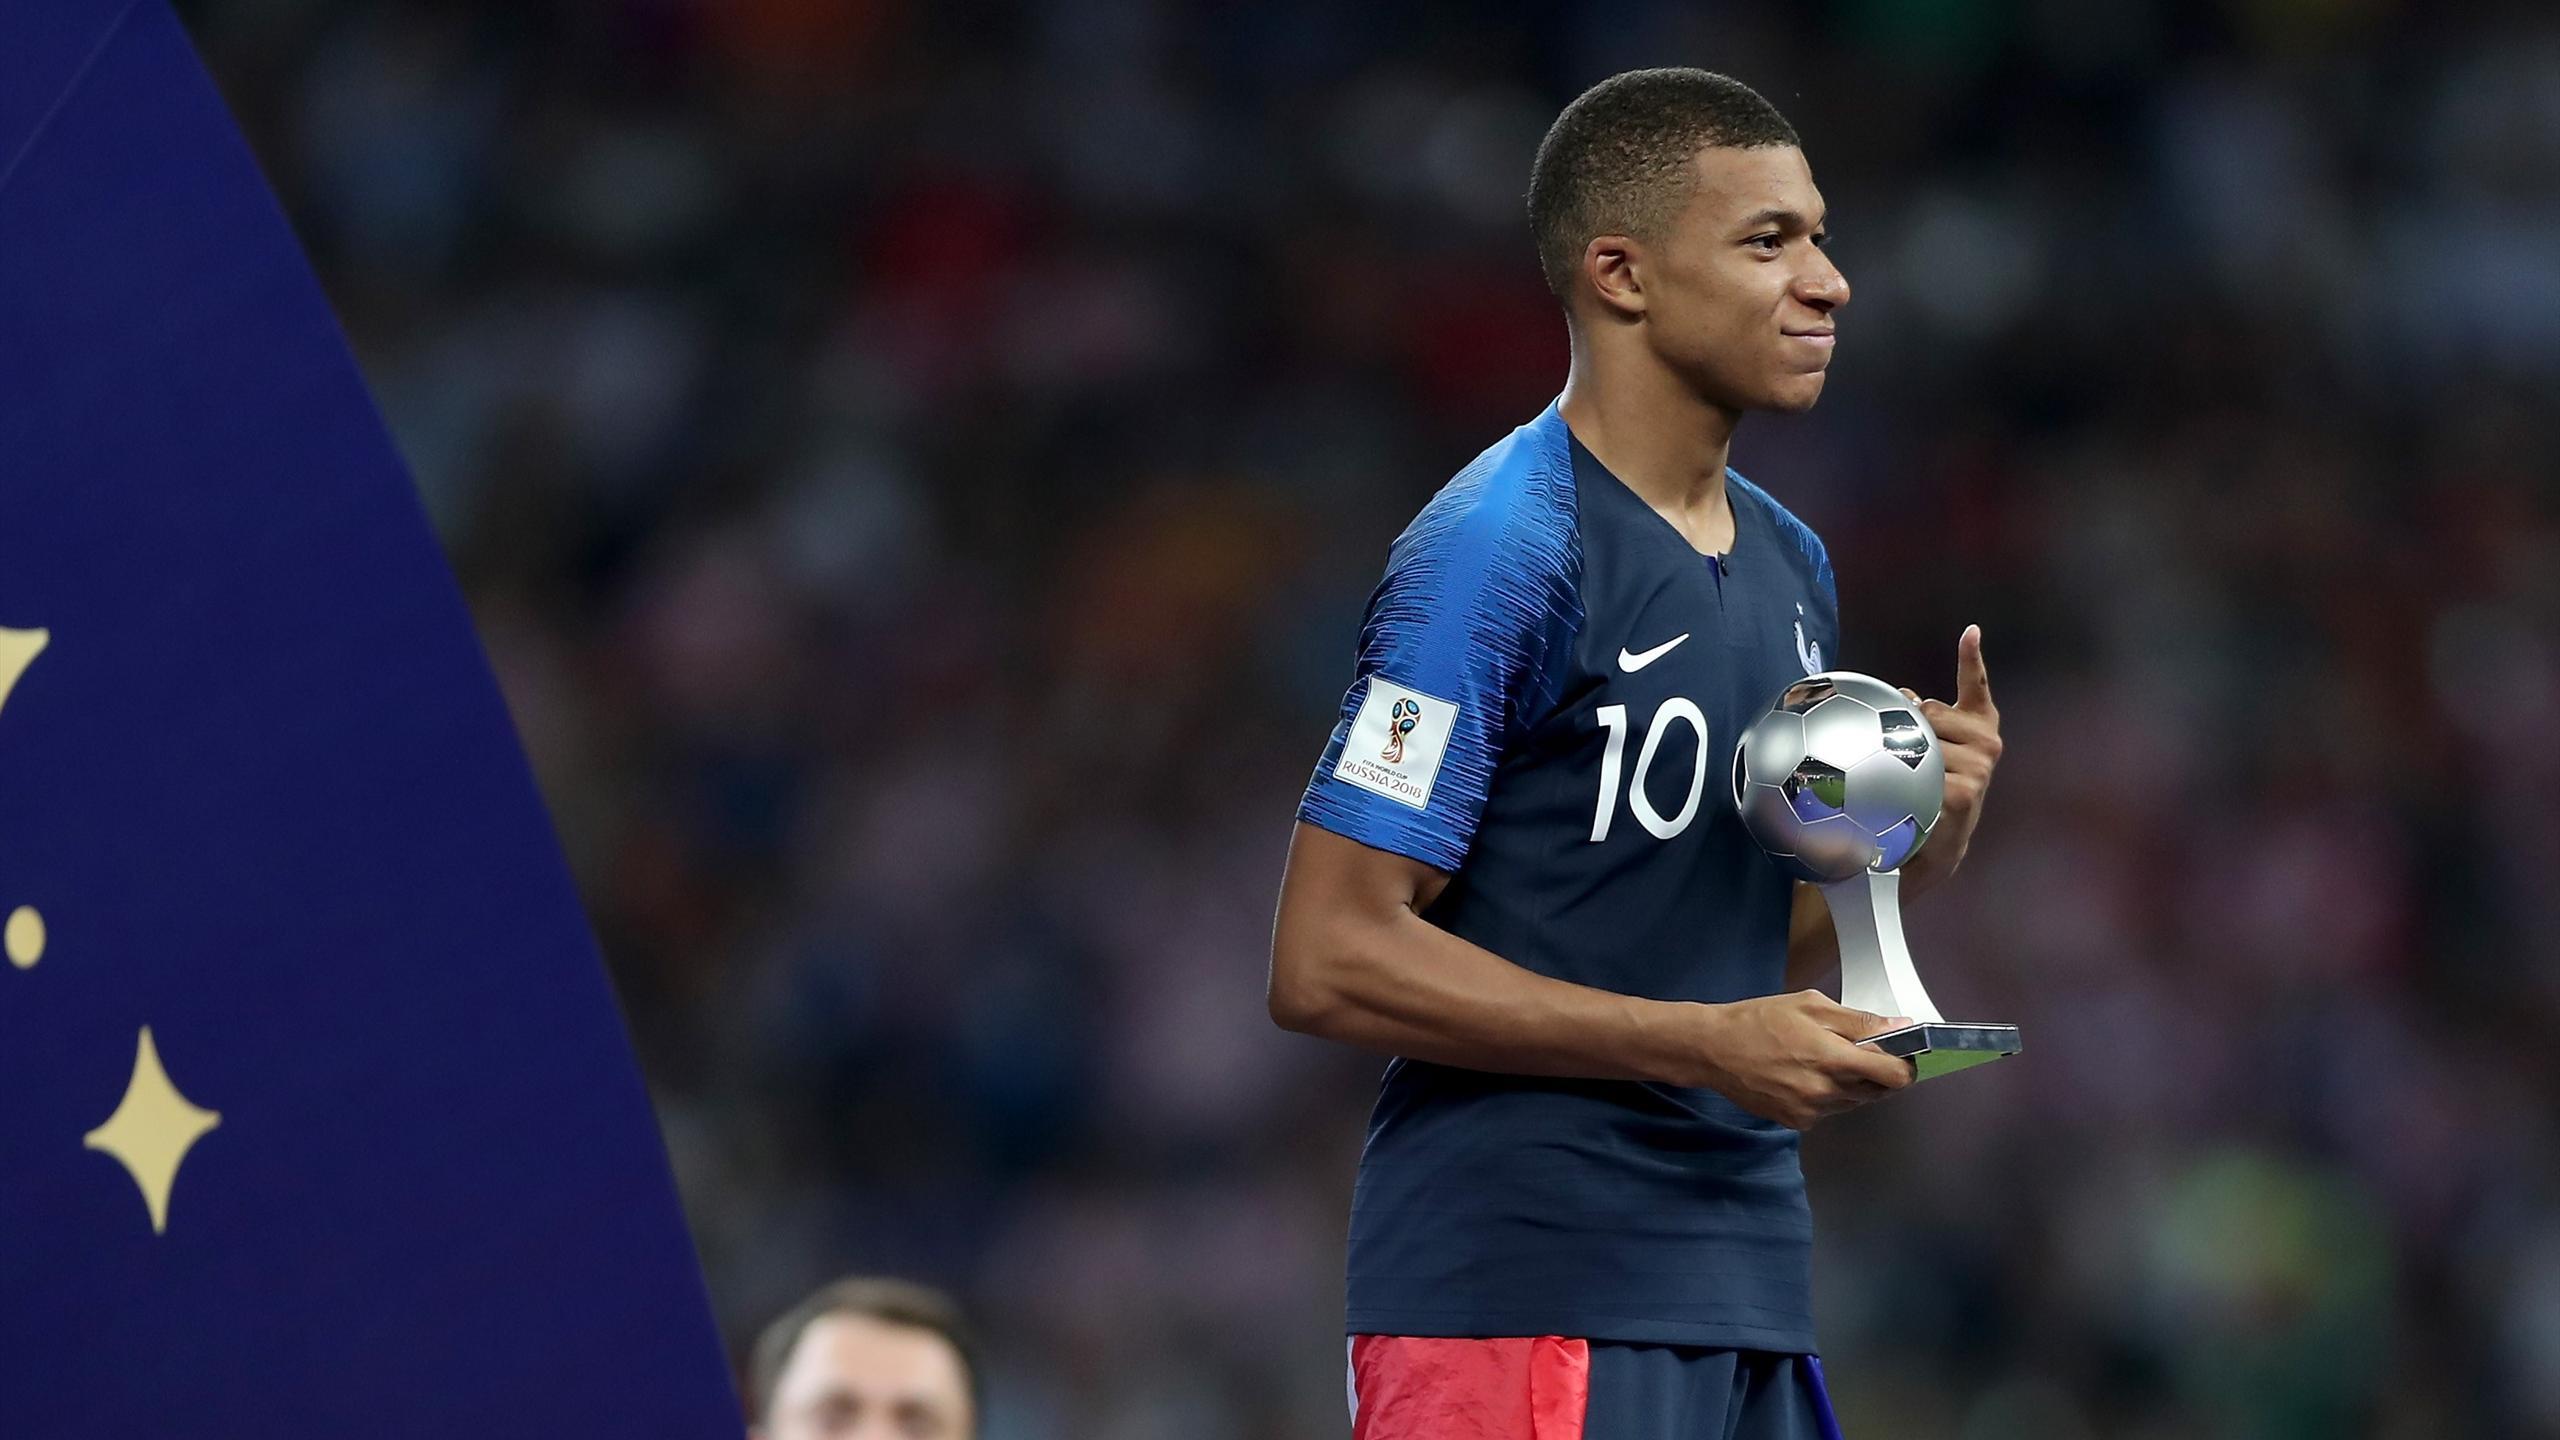 Kylian Mbappe Wins World Cup Young Player Award Eurosport